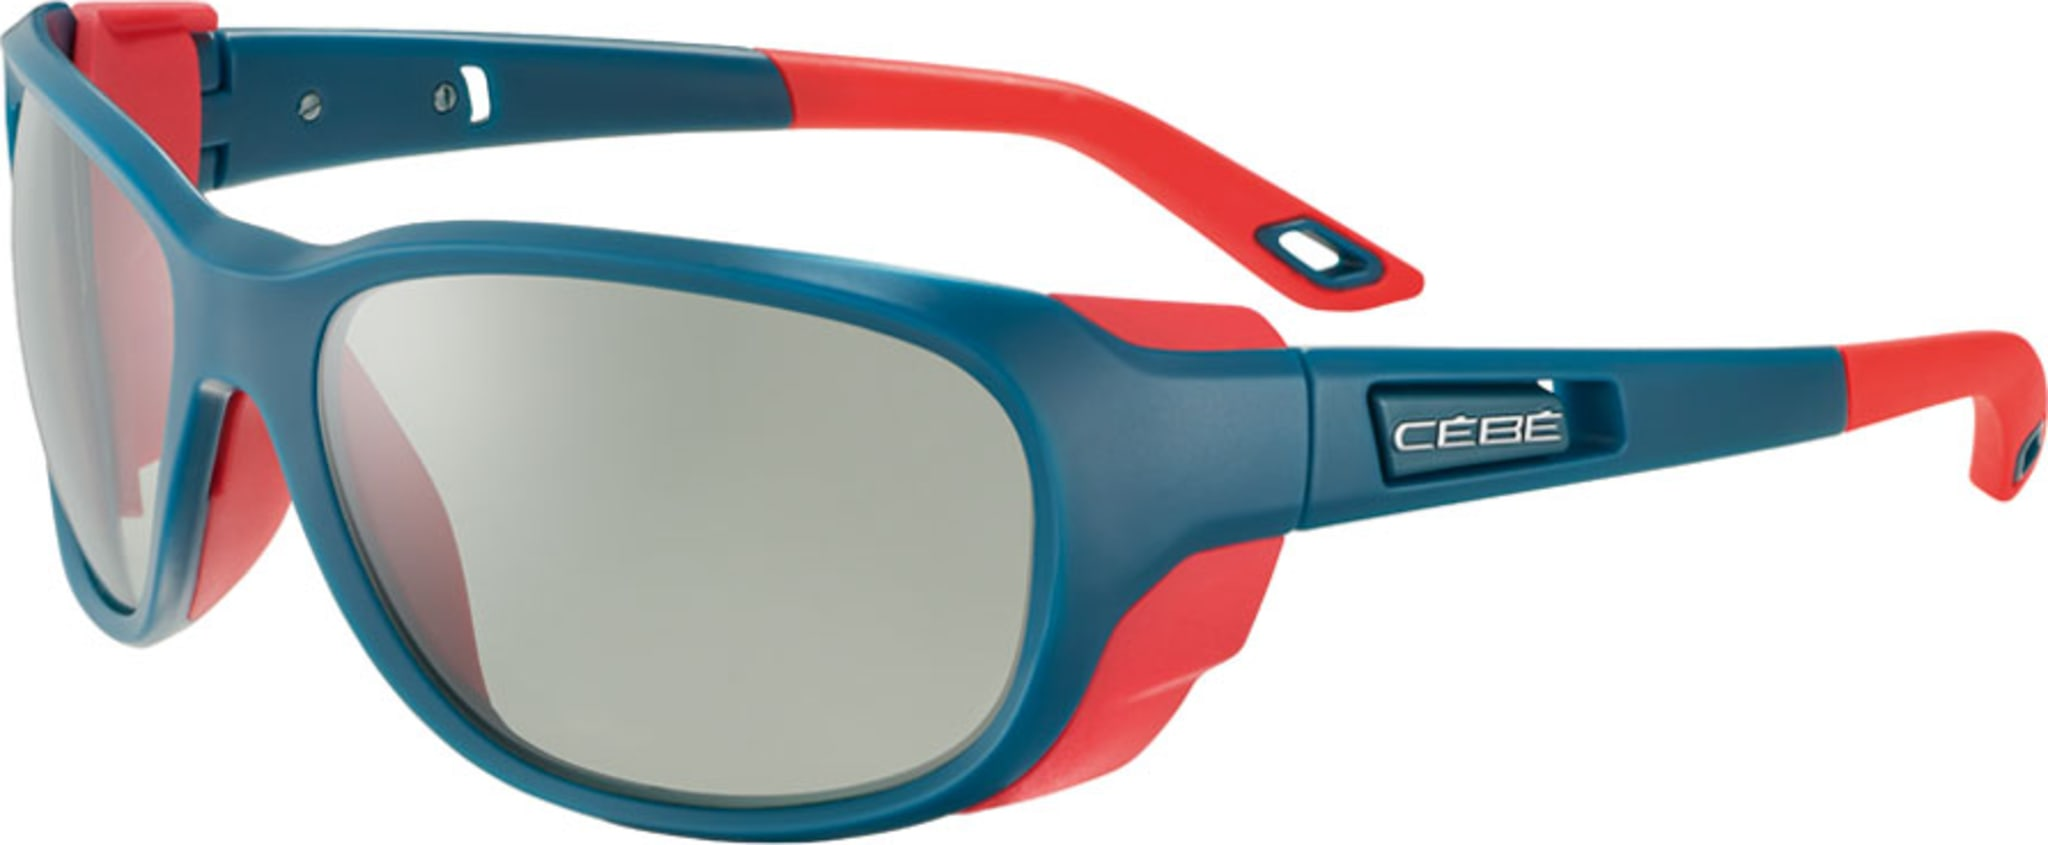 Røff fjellbrille